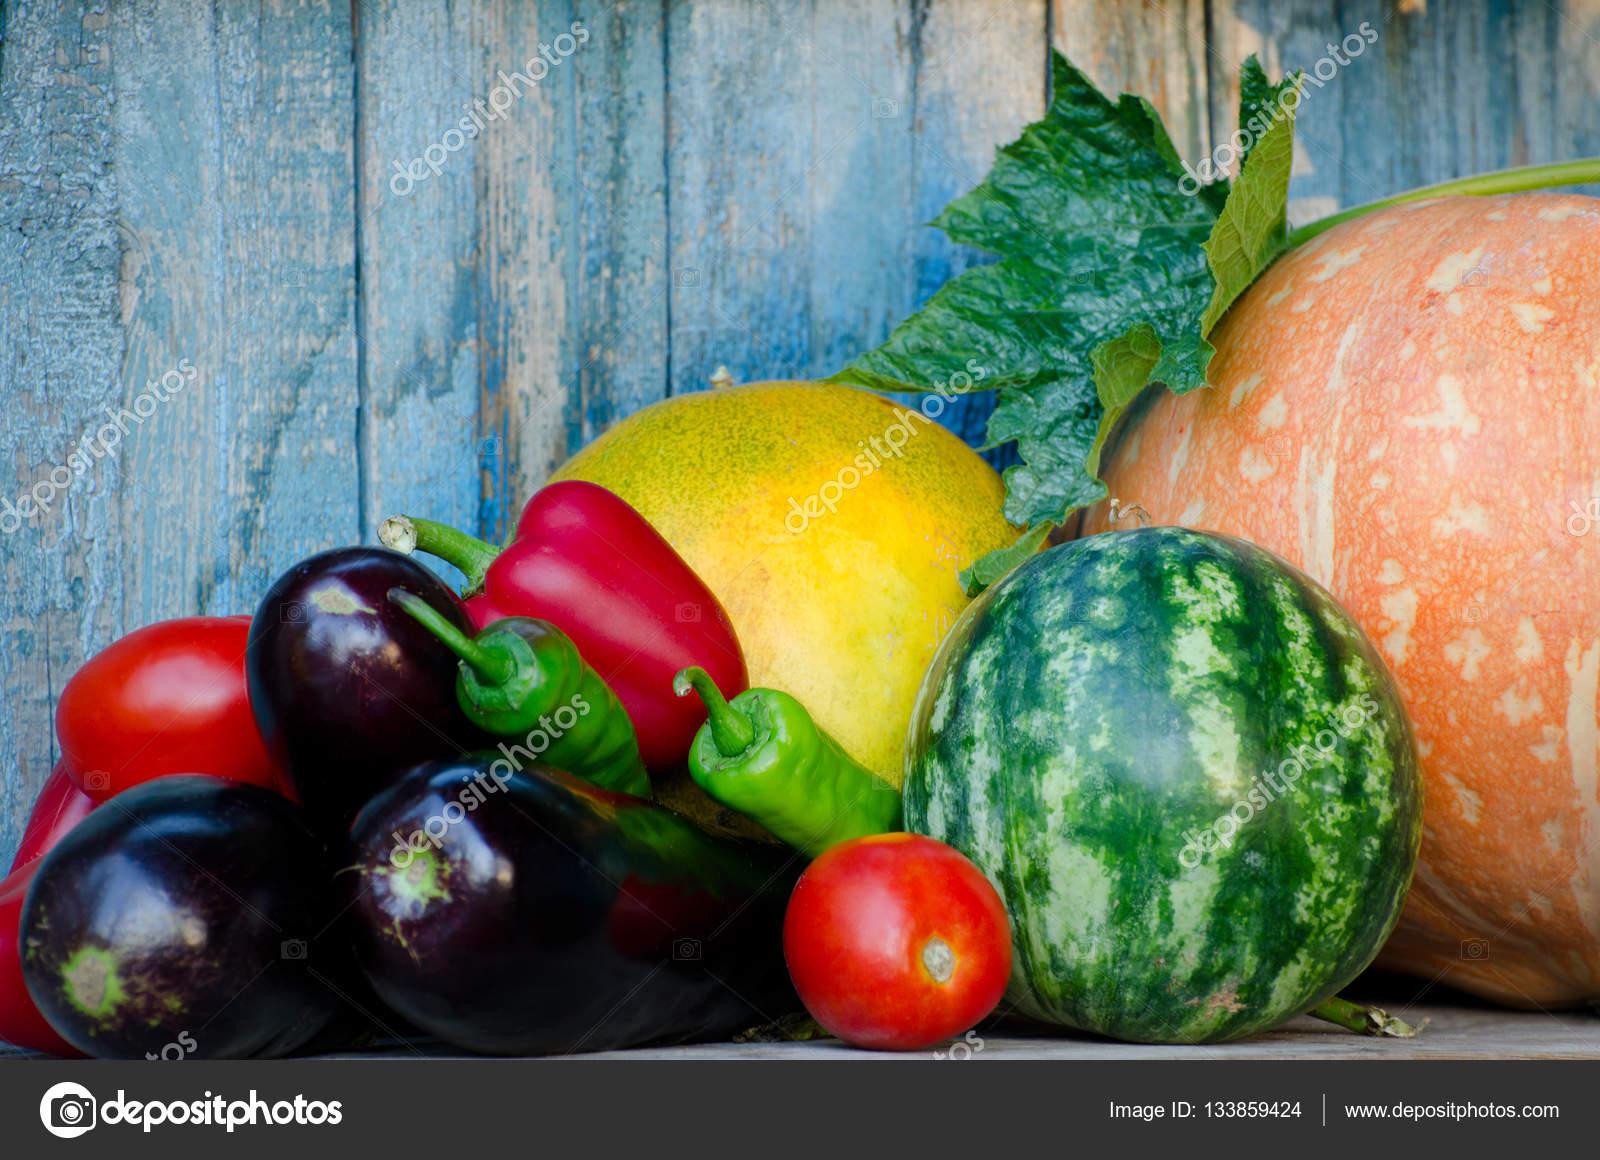 Натюрморт из овощей. Натюрморт из осенних овощей: дыня ...